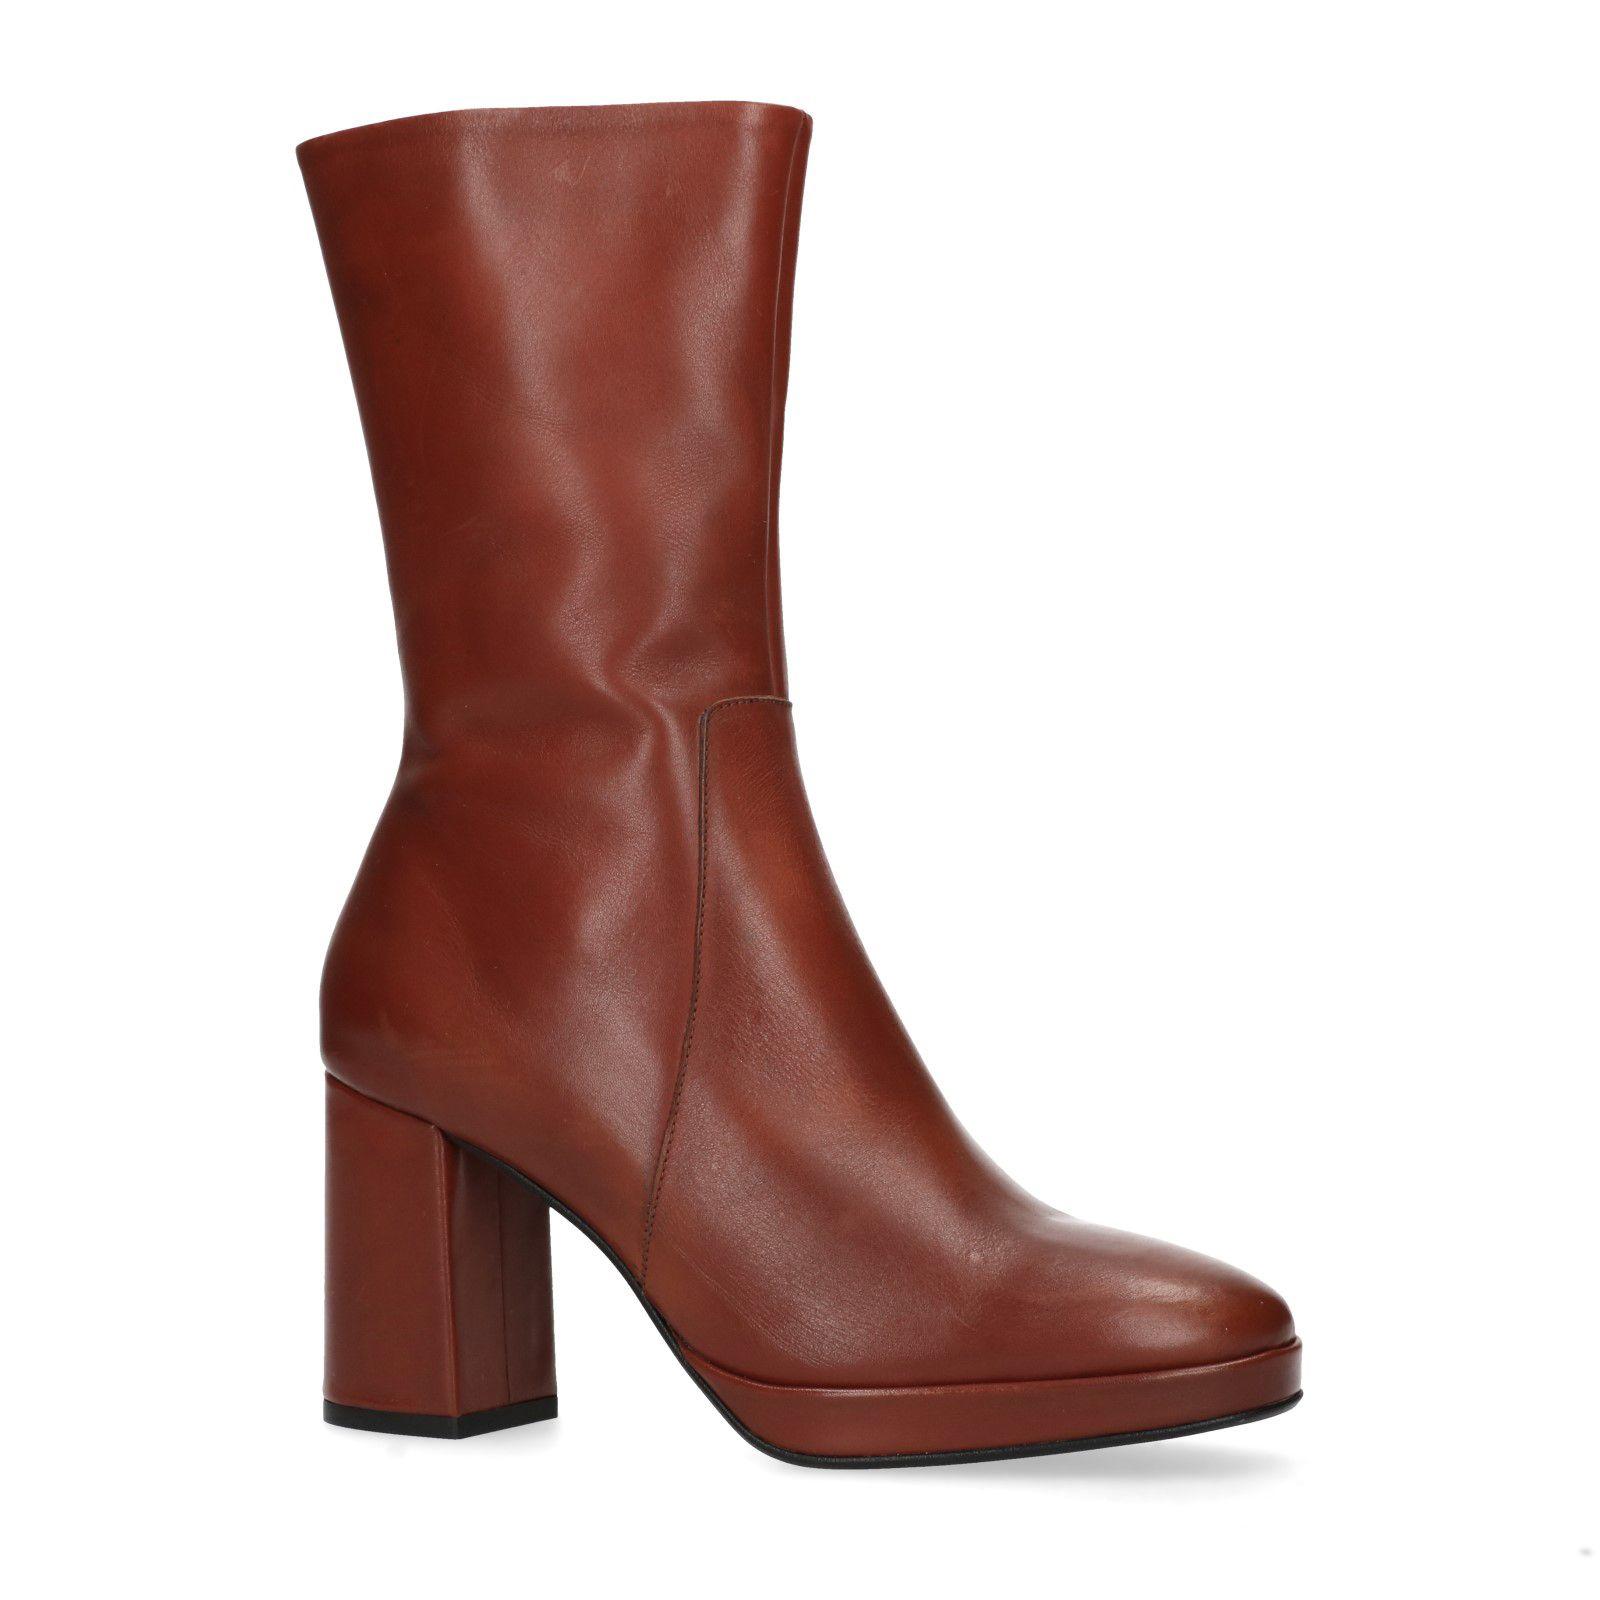 bottes cuir femme 36 tige courte